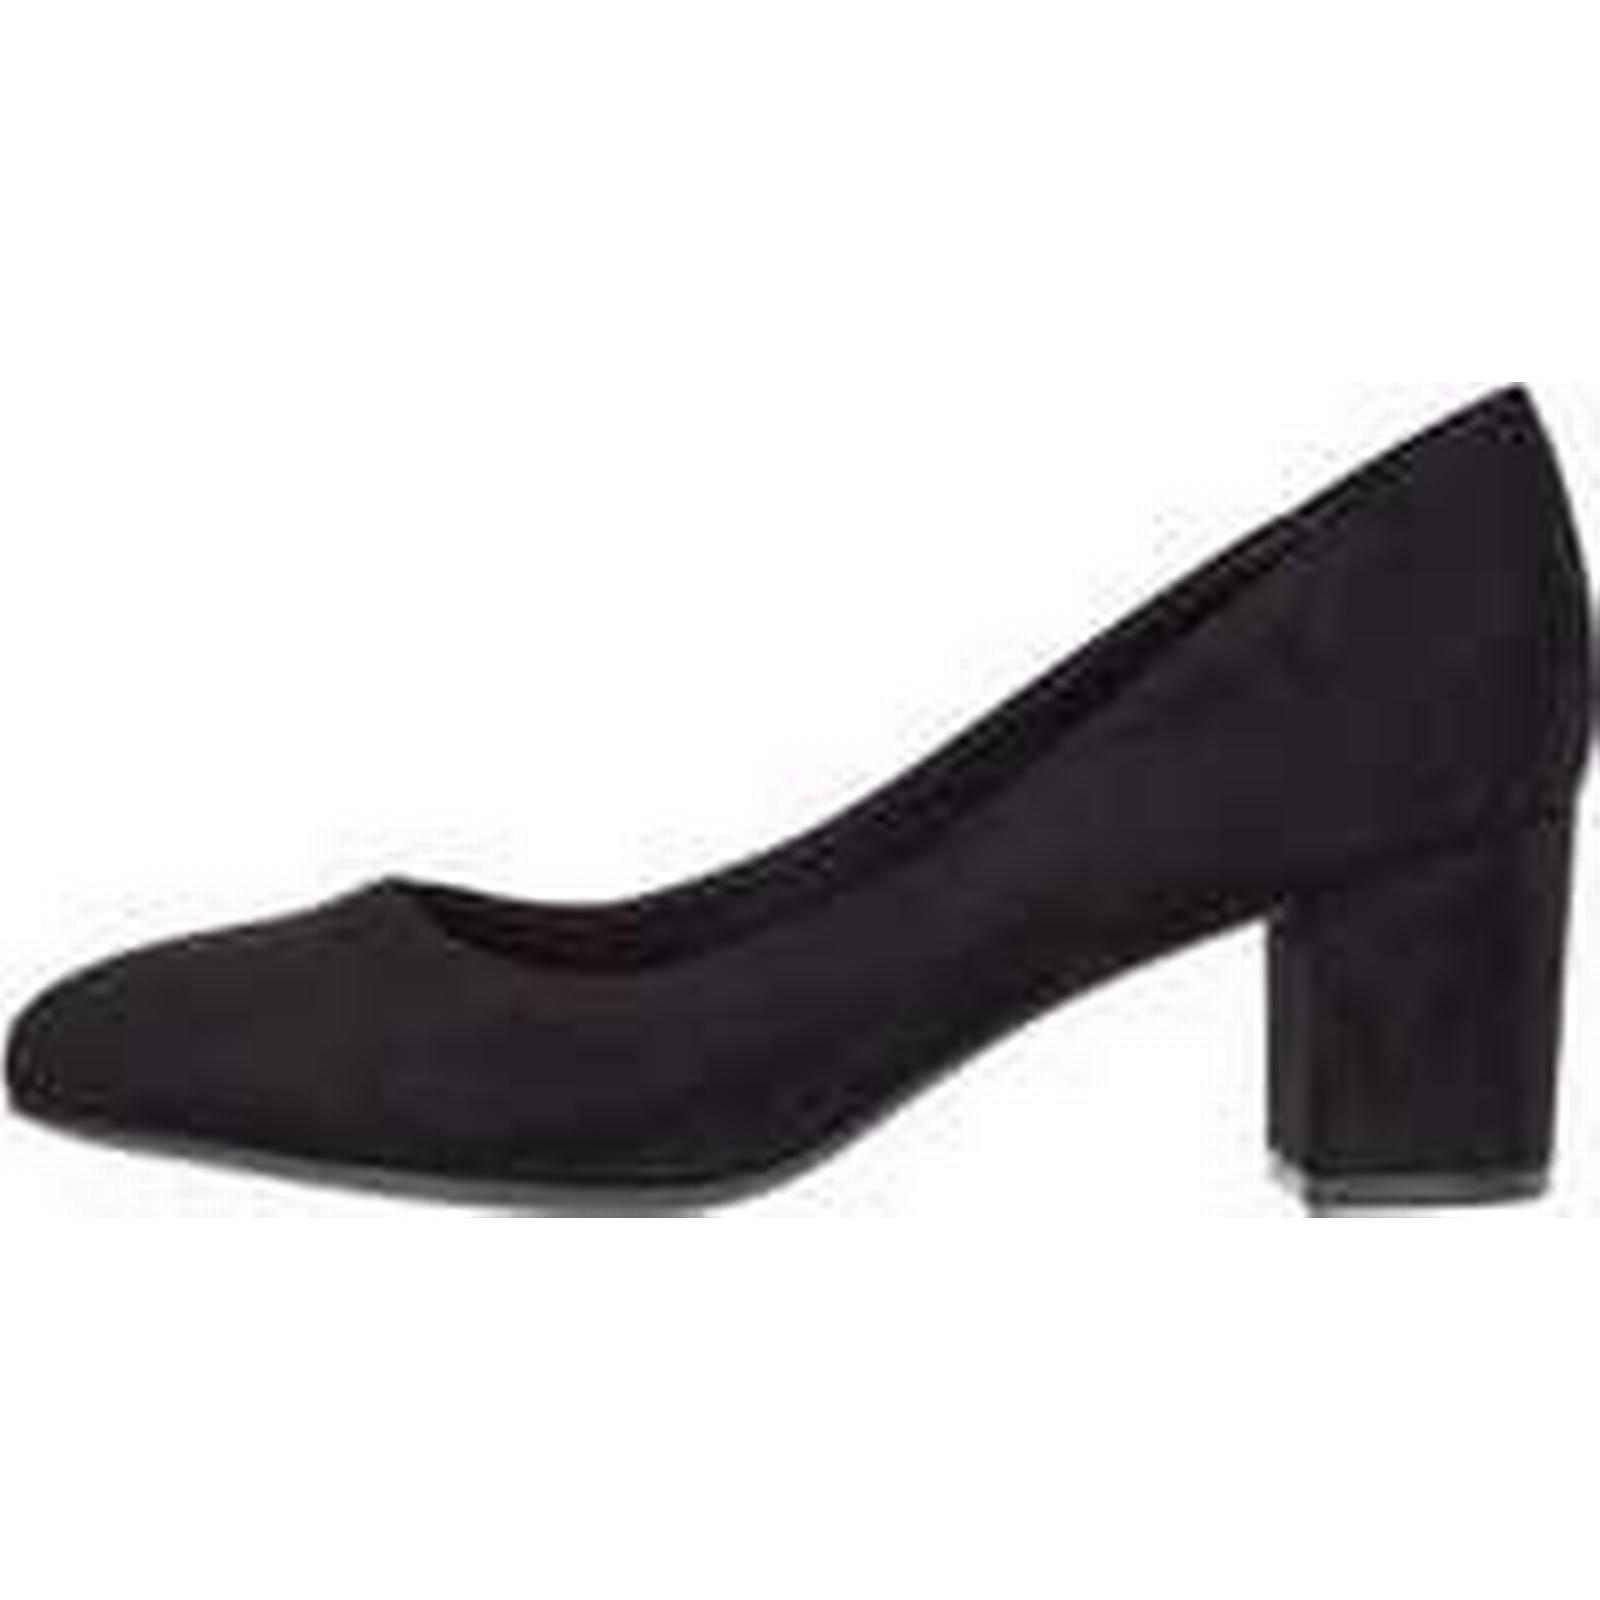 BIANCO Heel Block Heel BIANCO Pumps Women Black (41) 16f08b